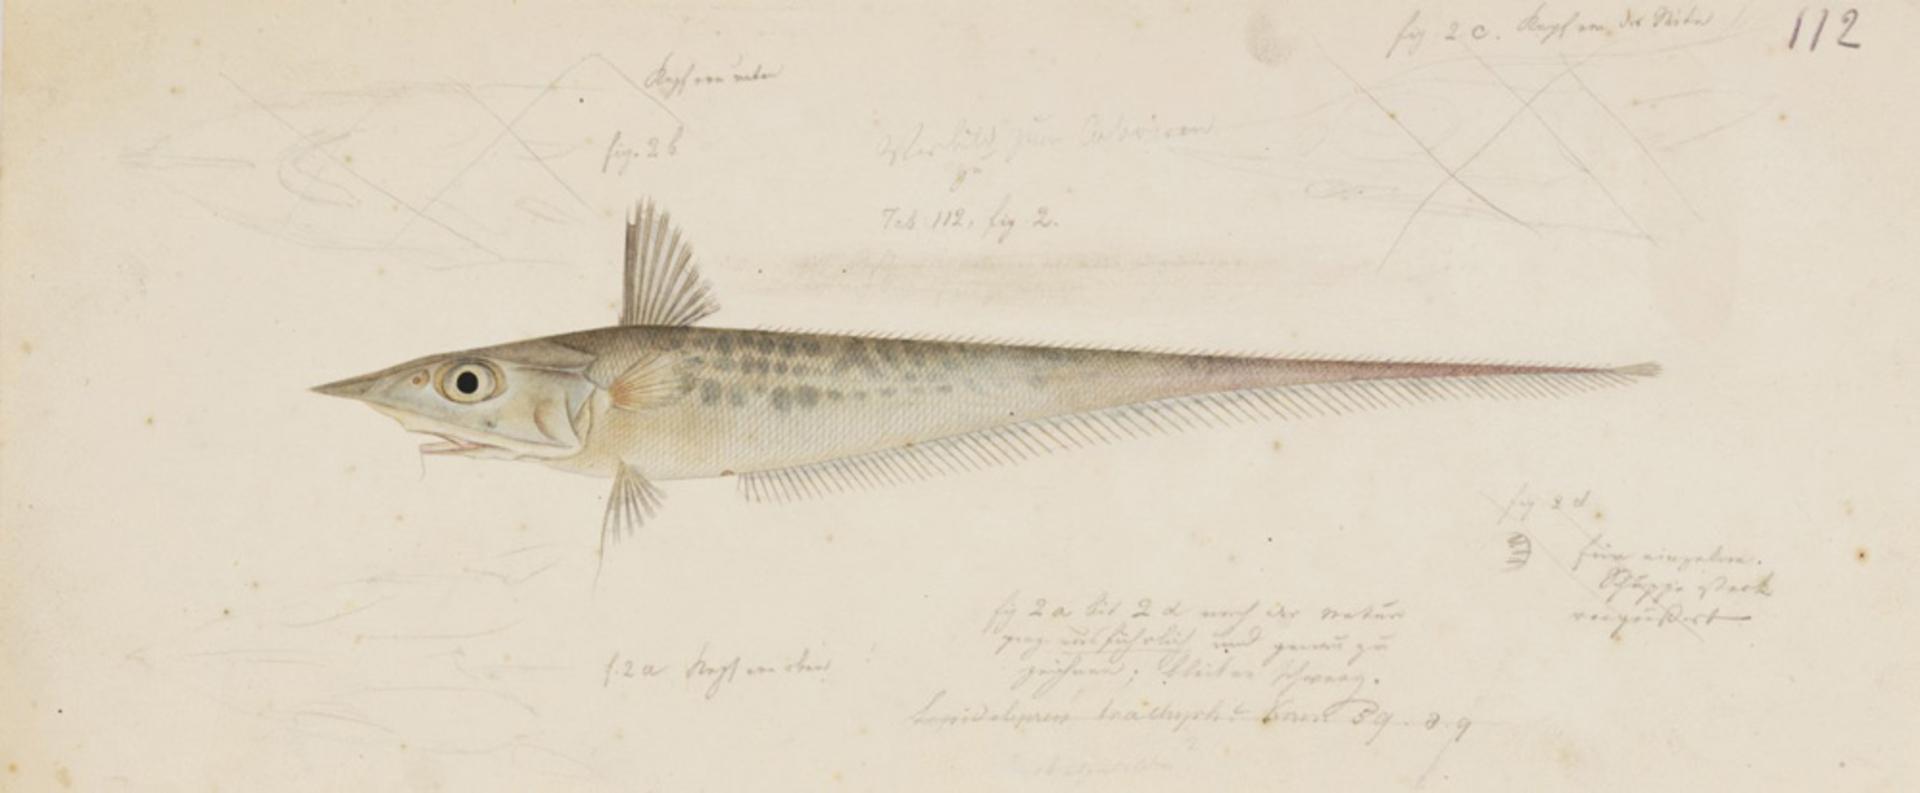 RMNH.ART.158 | Coelorhynchus japonicus